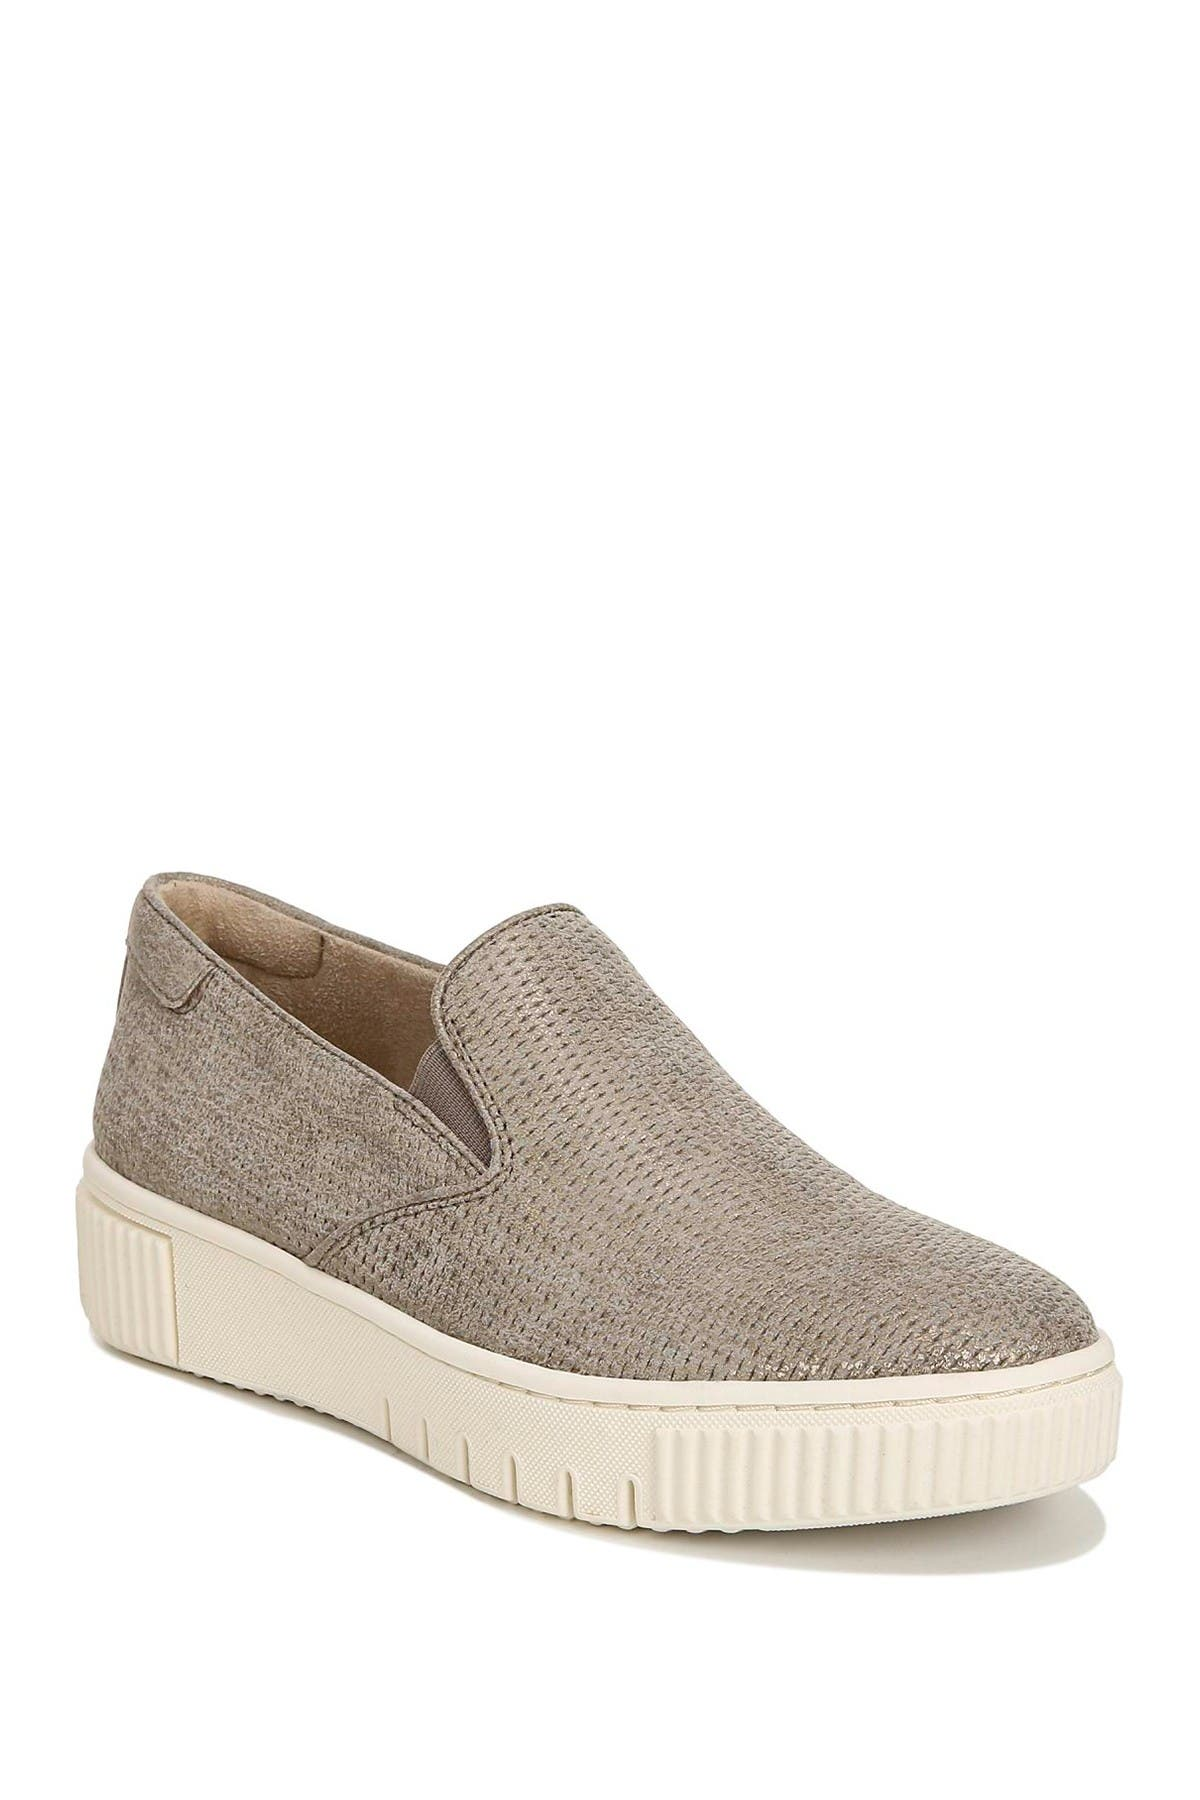 Image of SOUL Naturalizer Tia Slip-On Sneaker